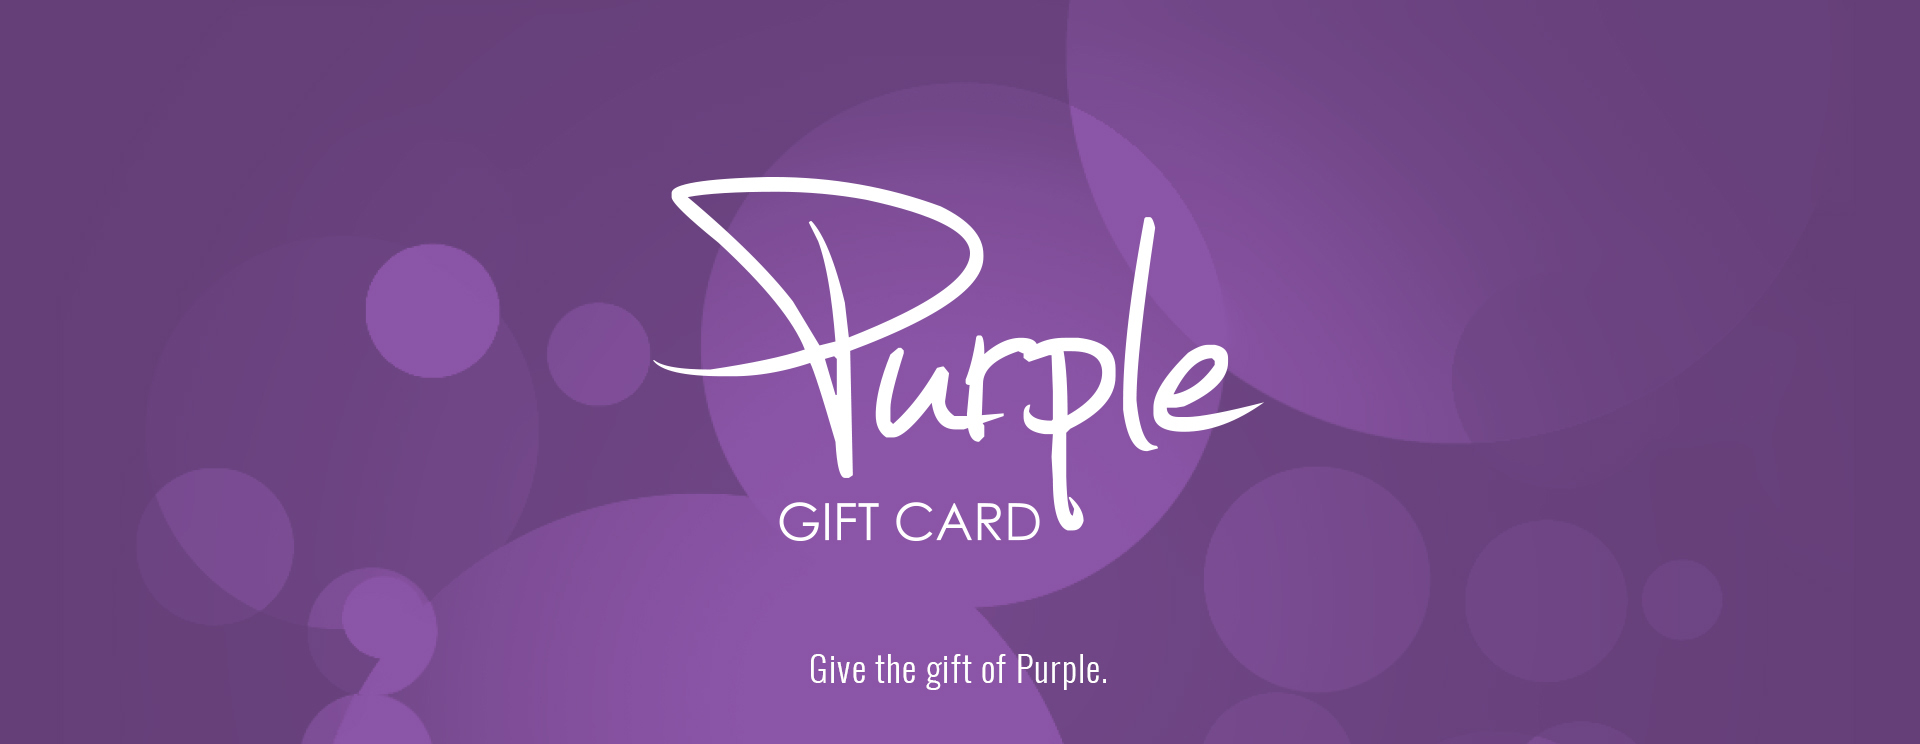 purple-card-poster.jpg